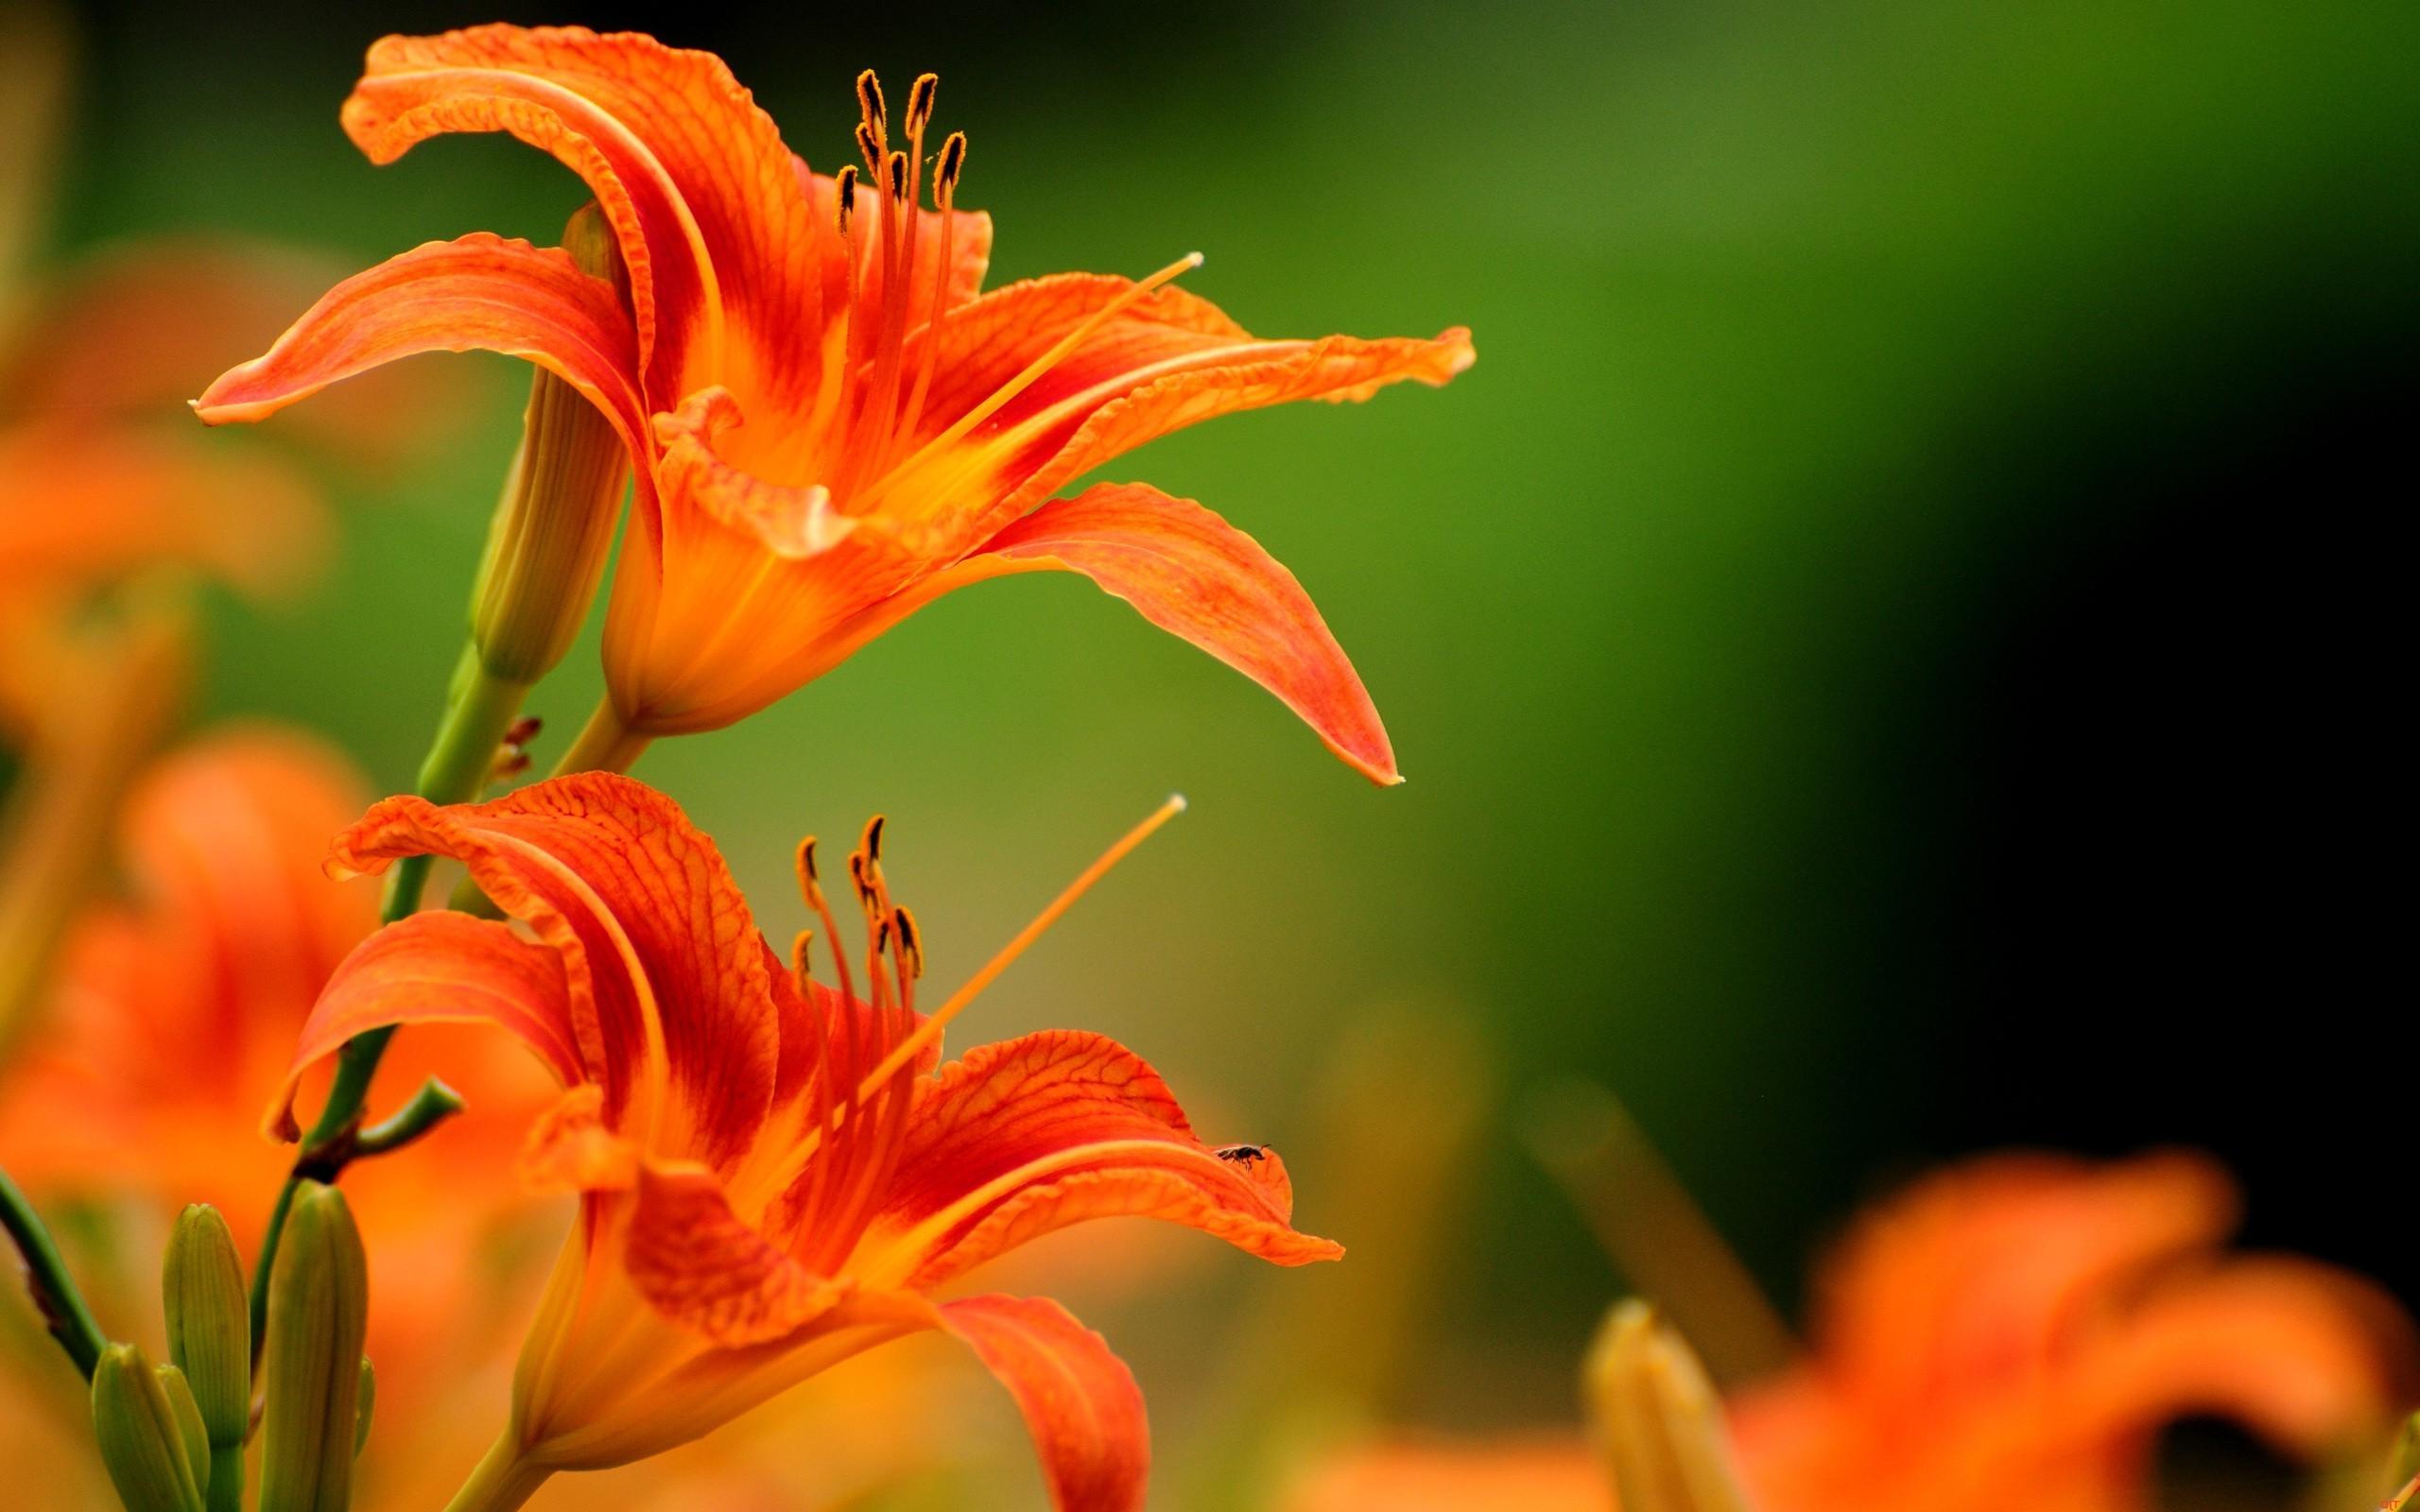 wallpaper : 2560x1600 px, lilies, orange flowers 2560x1600 - goodfon